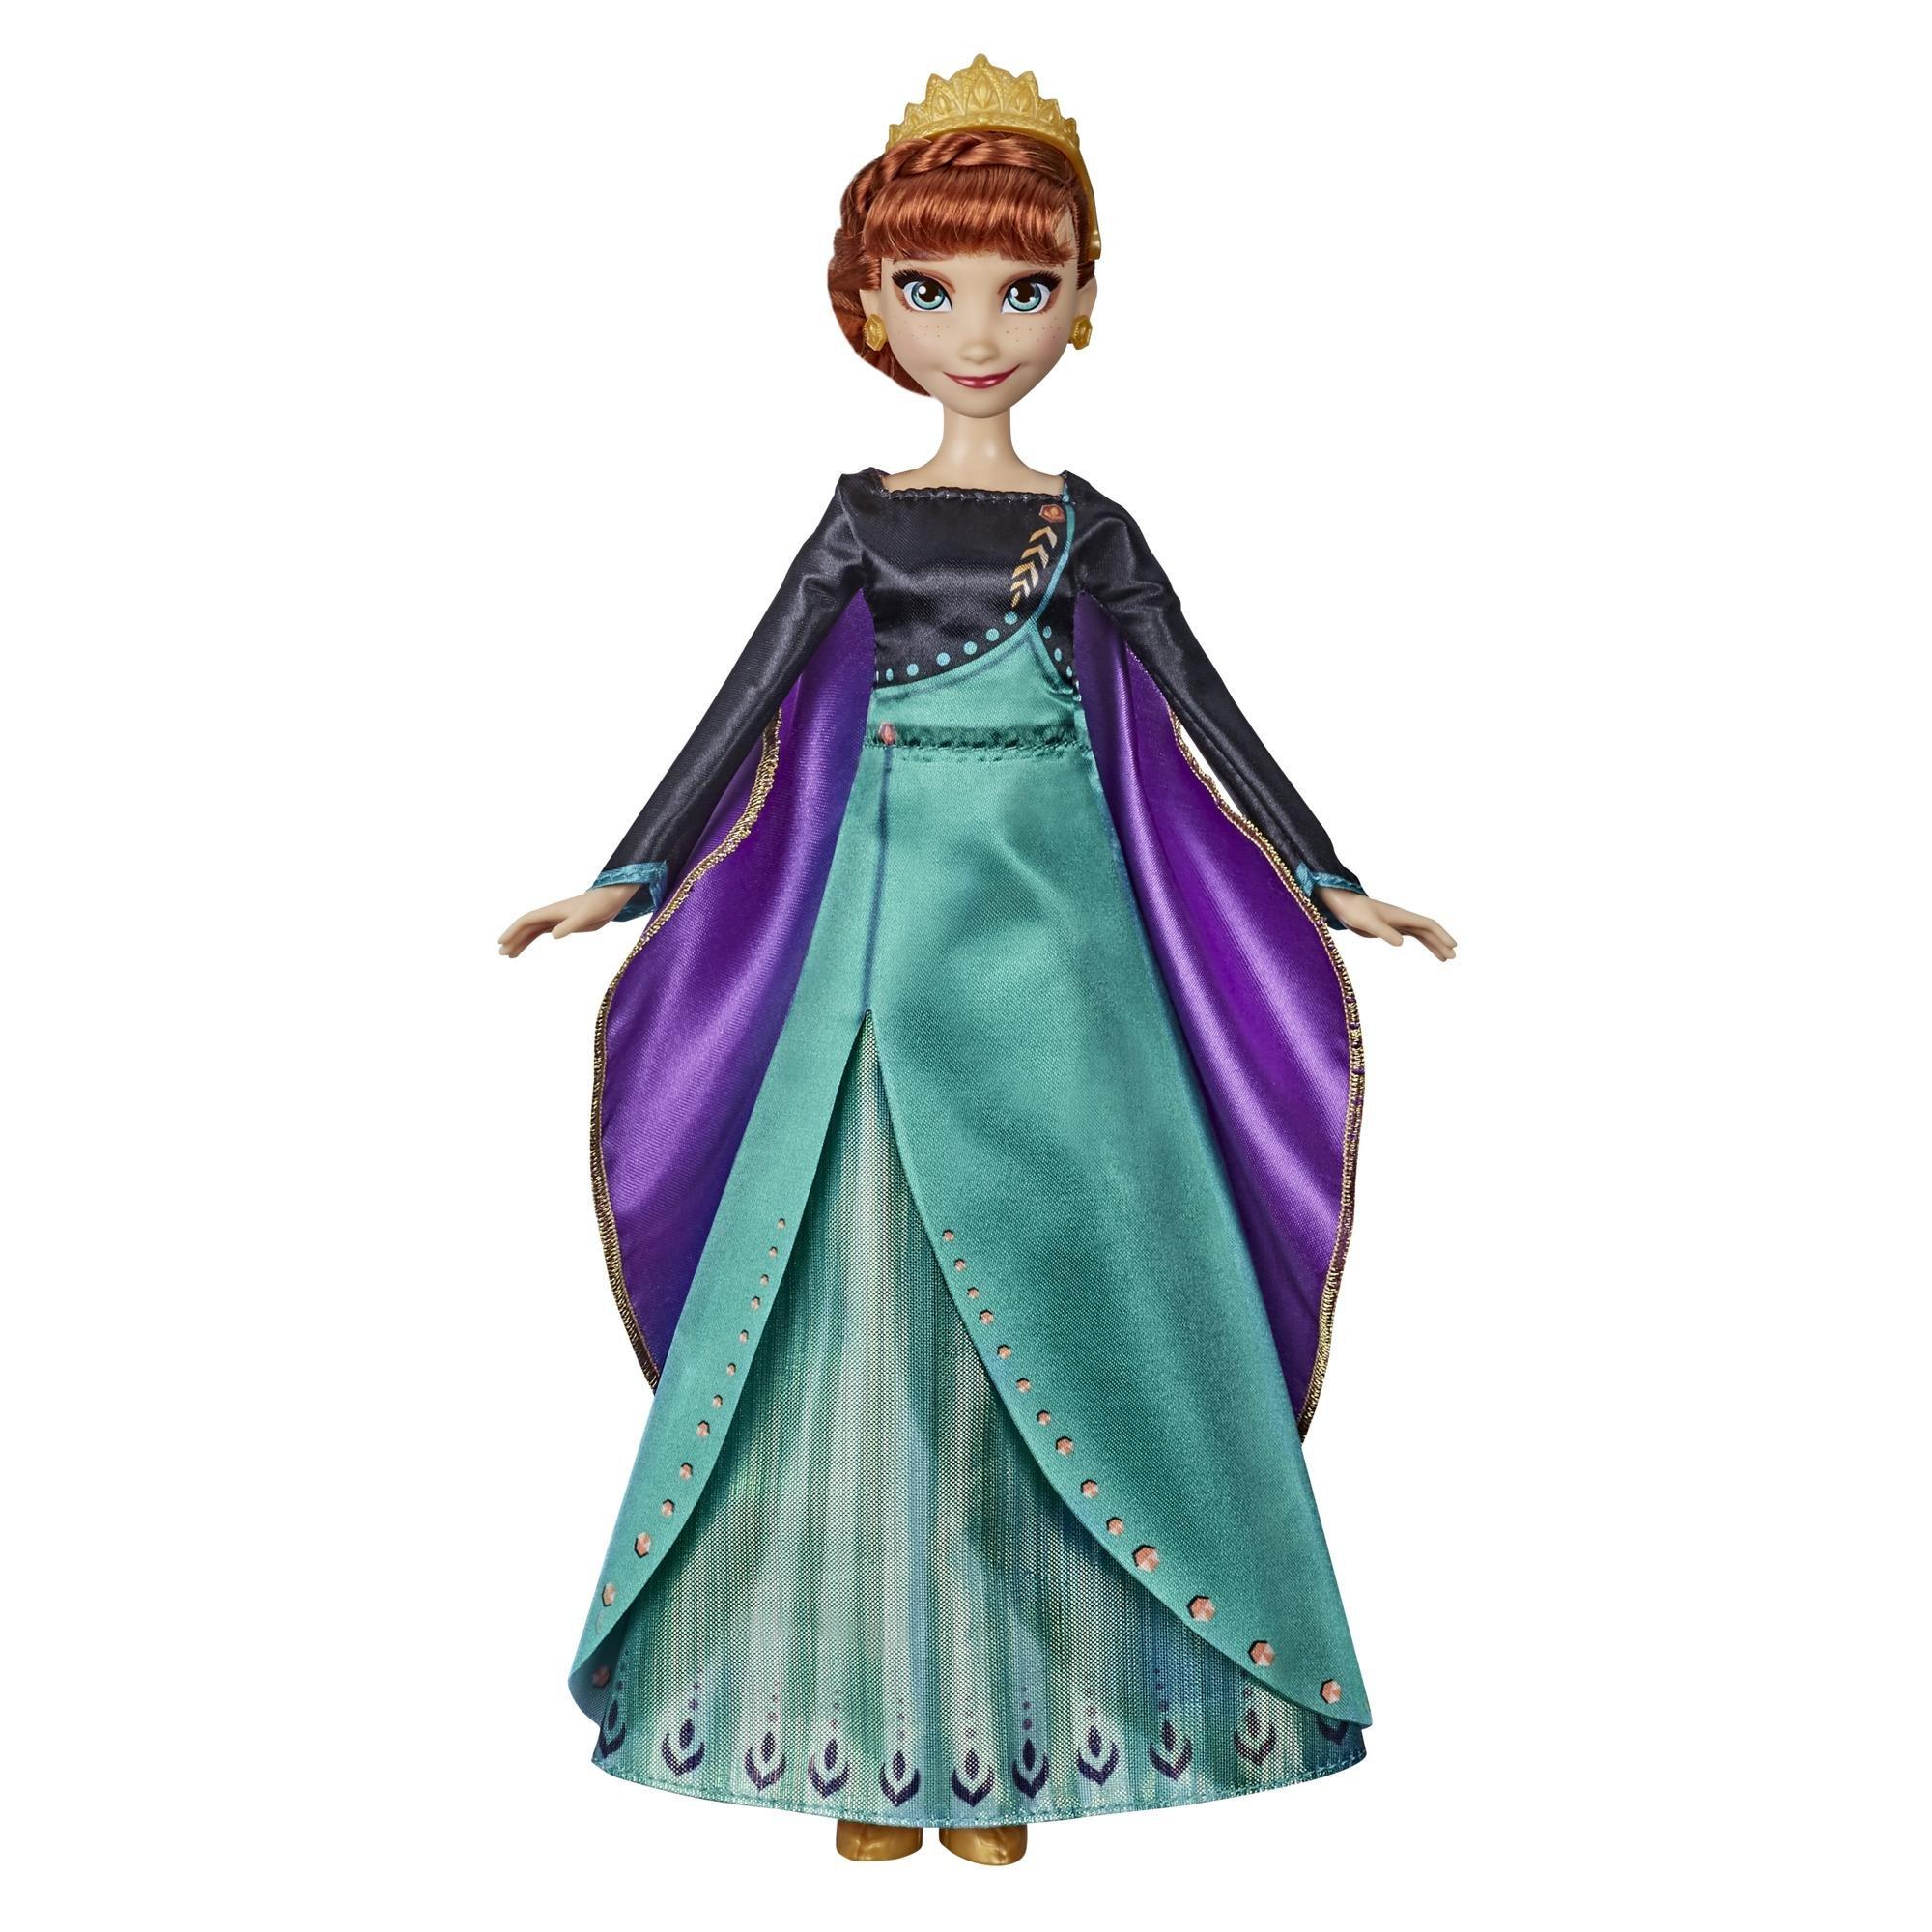 Disney Frozen 2 - Musical Adventure Anna (E8881)